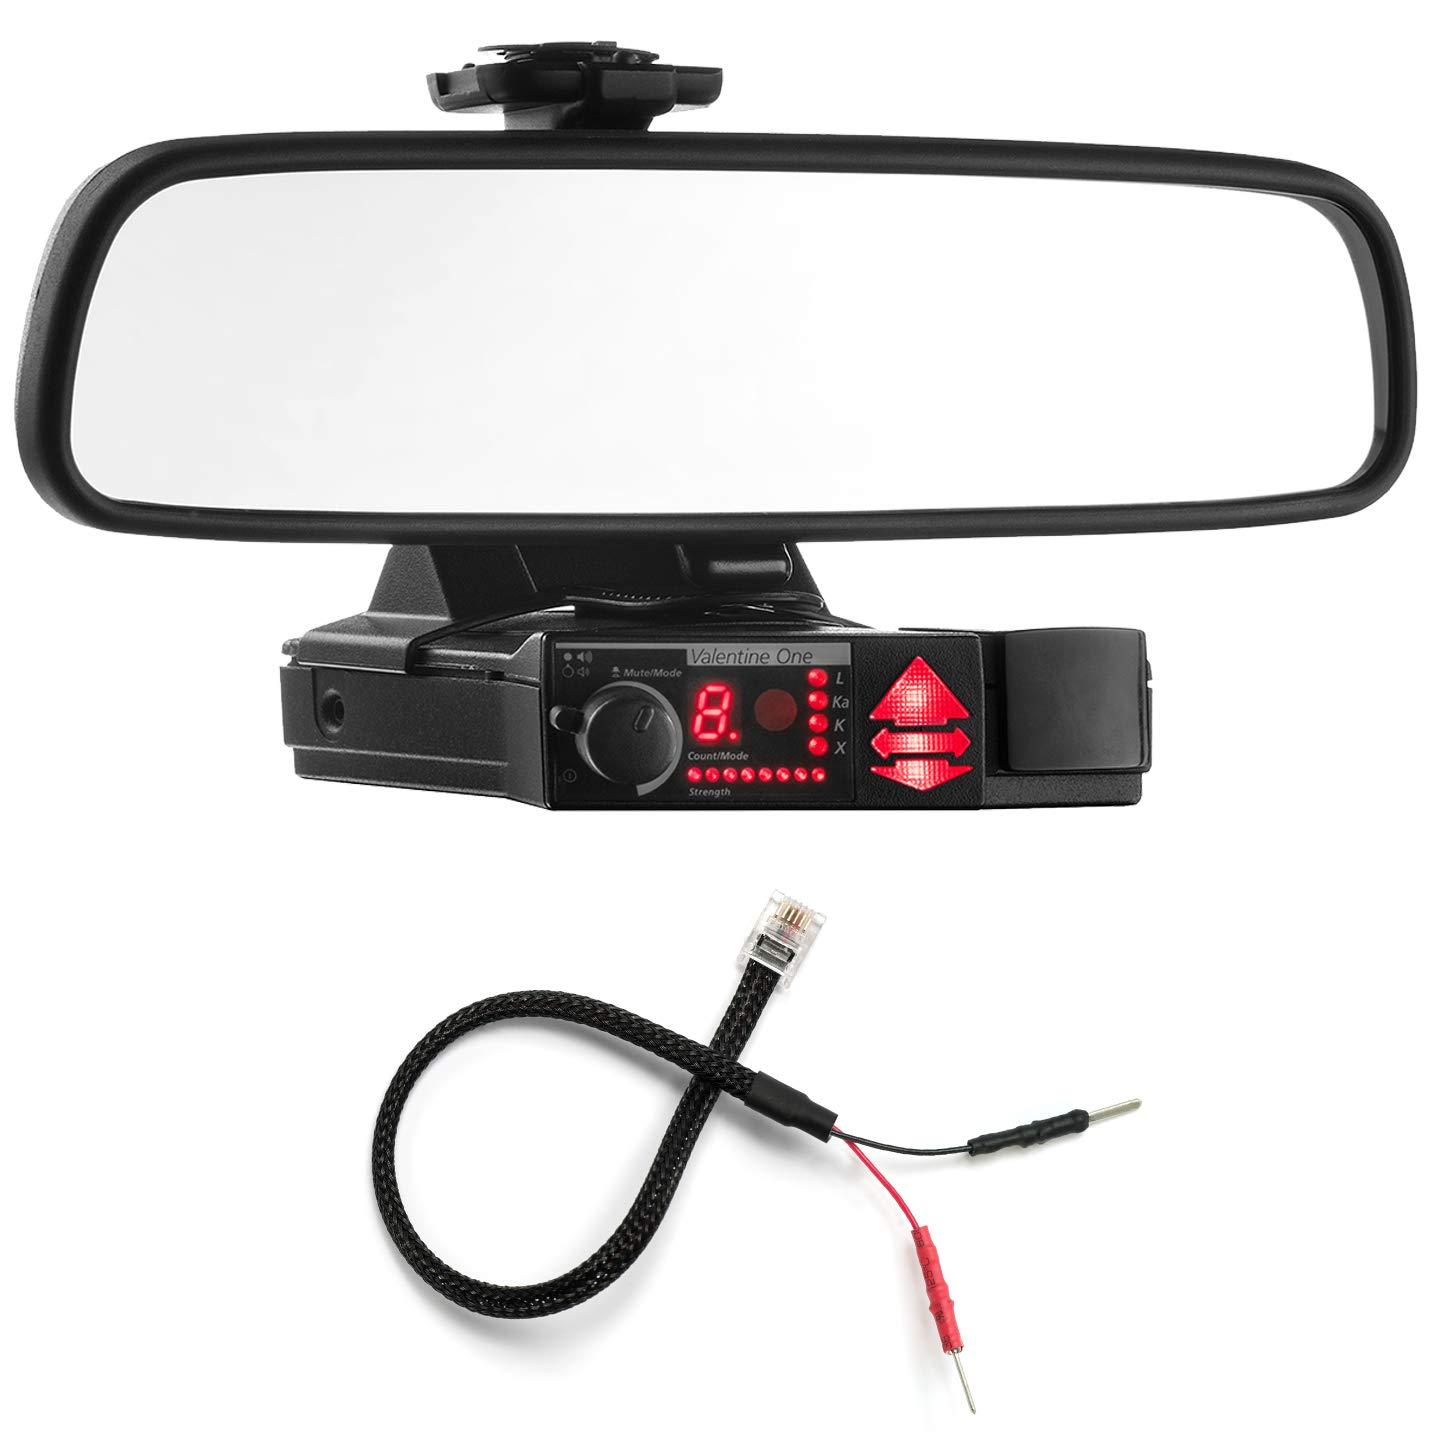 Best Rated In Radar Detectors Helpful Customer Reviews Jeep Tj Clock Spring Wiring Mount Mirror Bracket Wire Power Cord Valentine V1 Detector Product